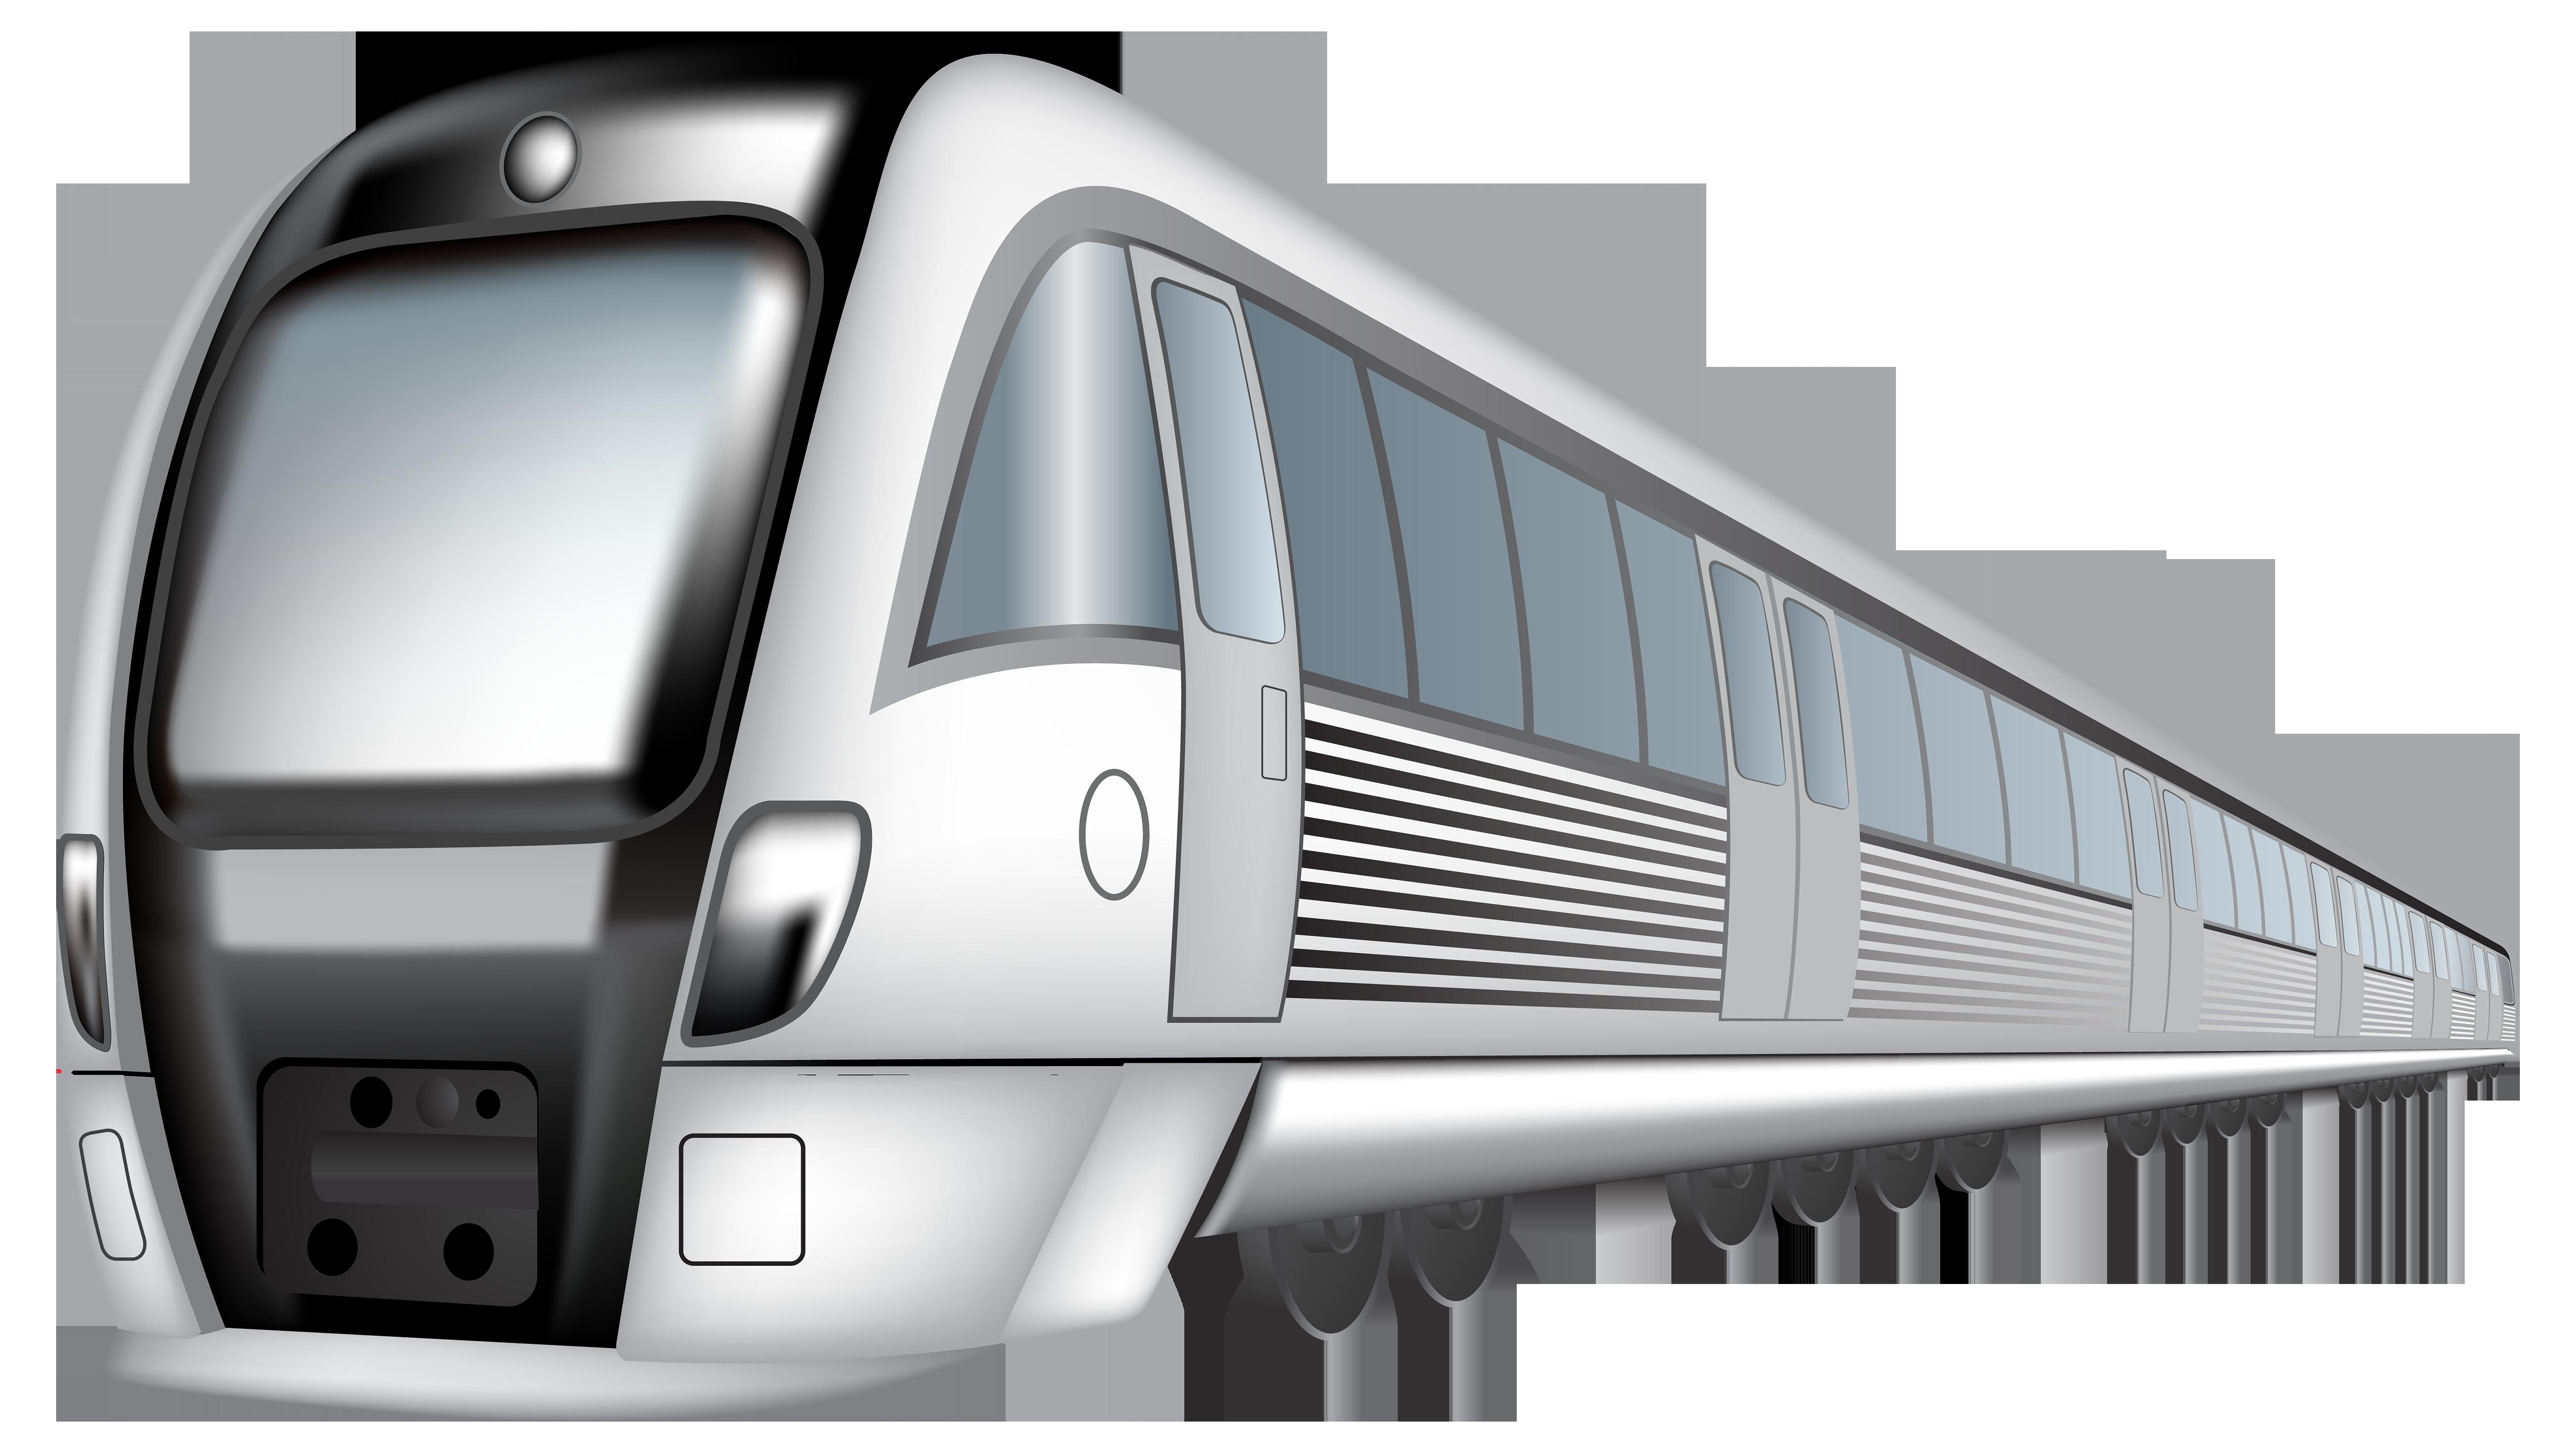 Train car silhouette clipart svg free download Train Rail transport High-speed rail Clip art - Bullet train ... svg free download